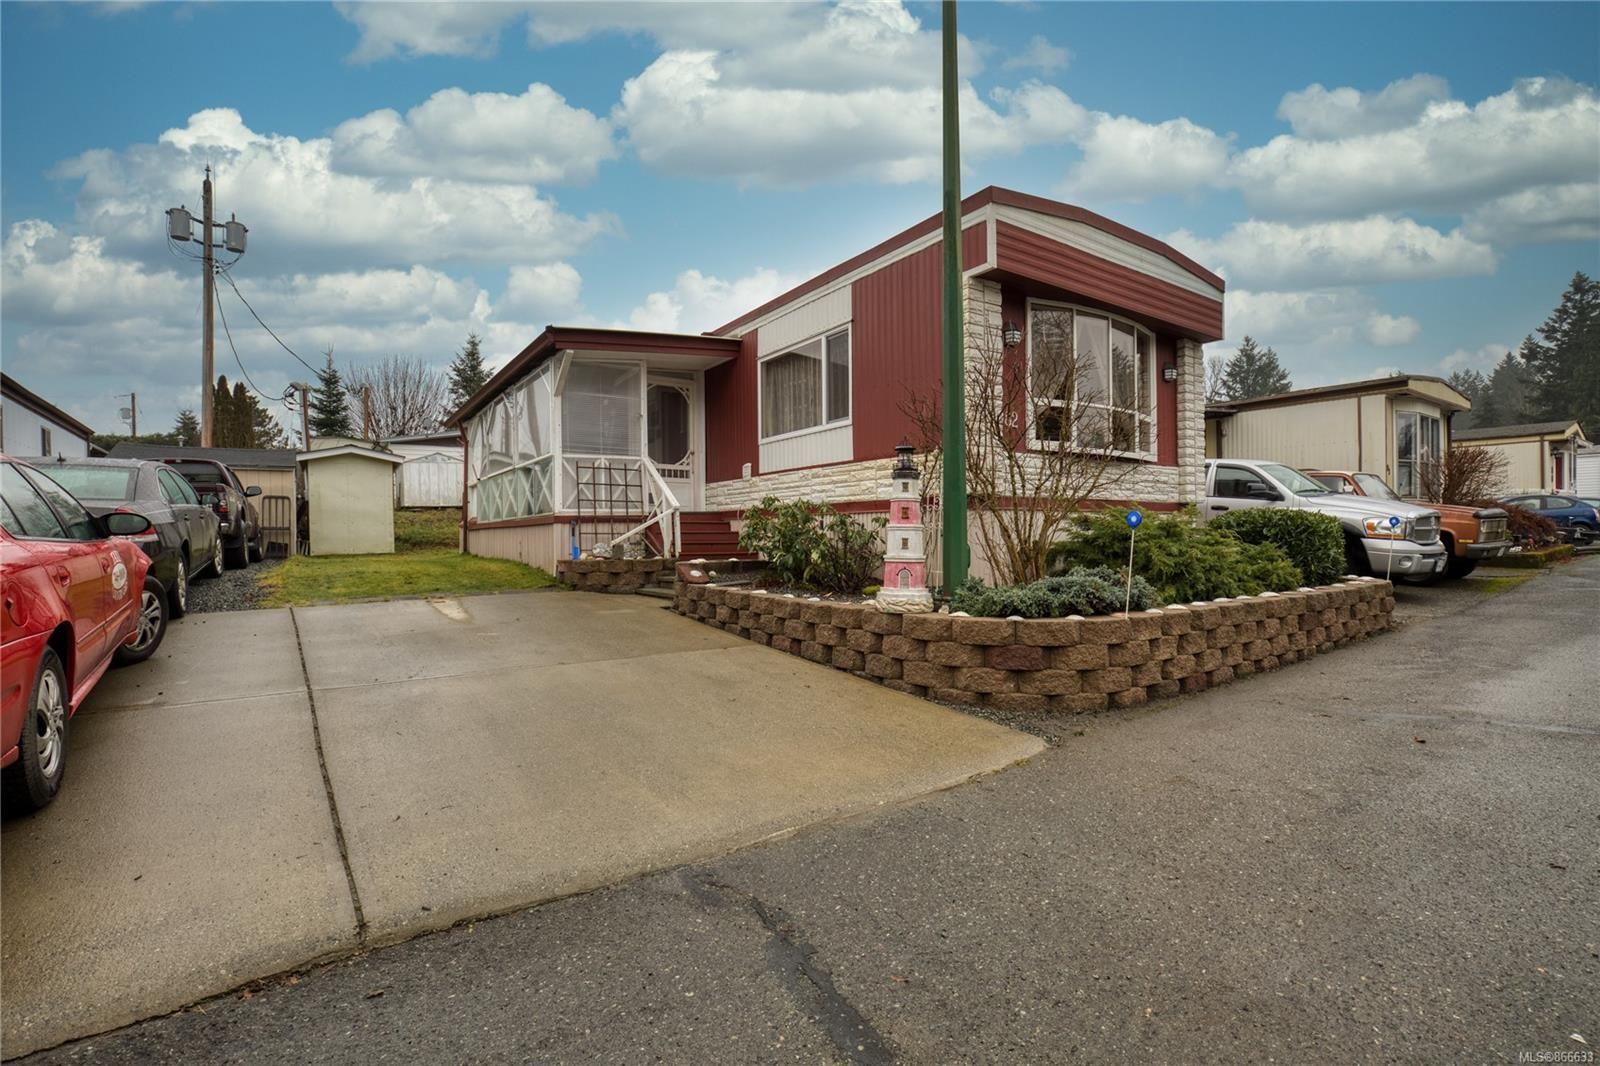 Main Photo: 82 3497 Gibbins Rd in : Du West Duncan Manufactured Home for sale (Duncan)  : MLS®# 866633